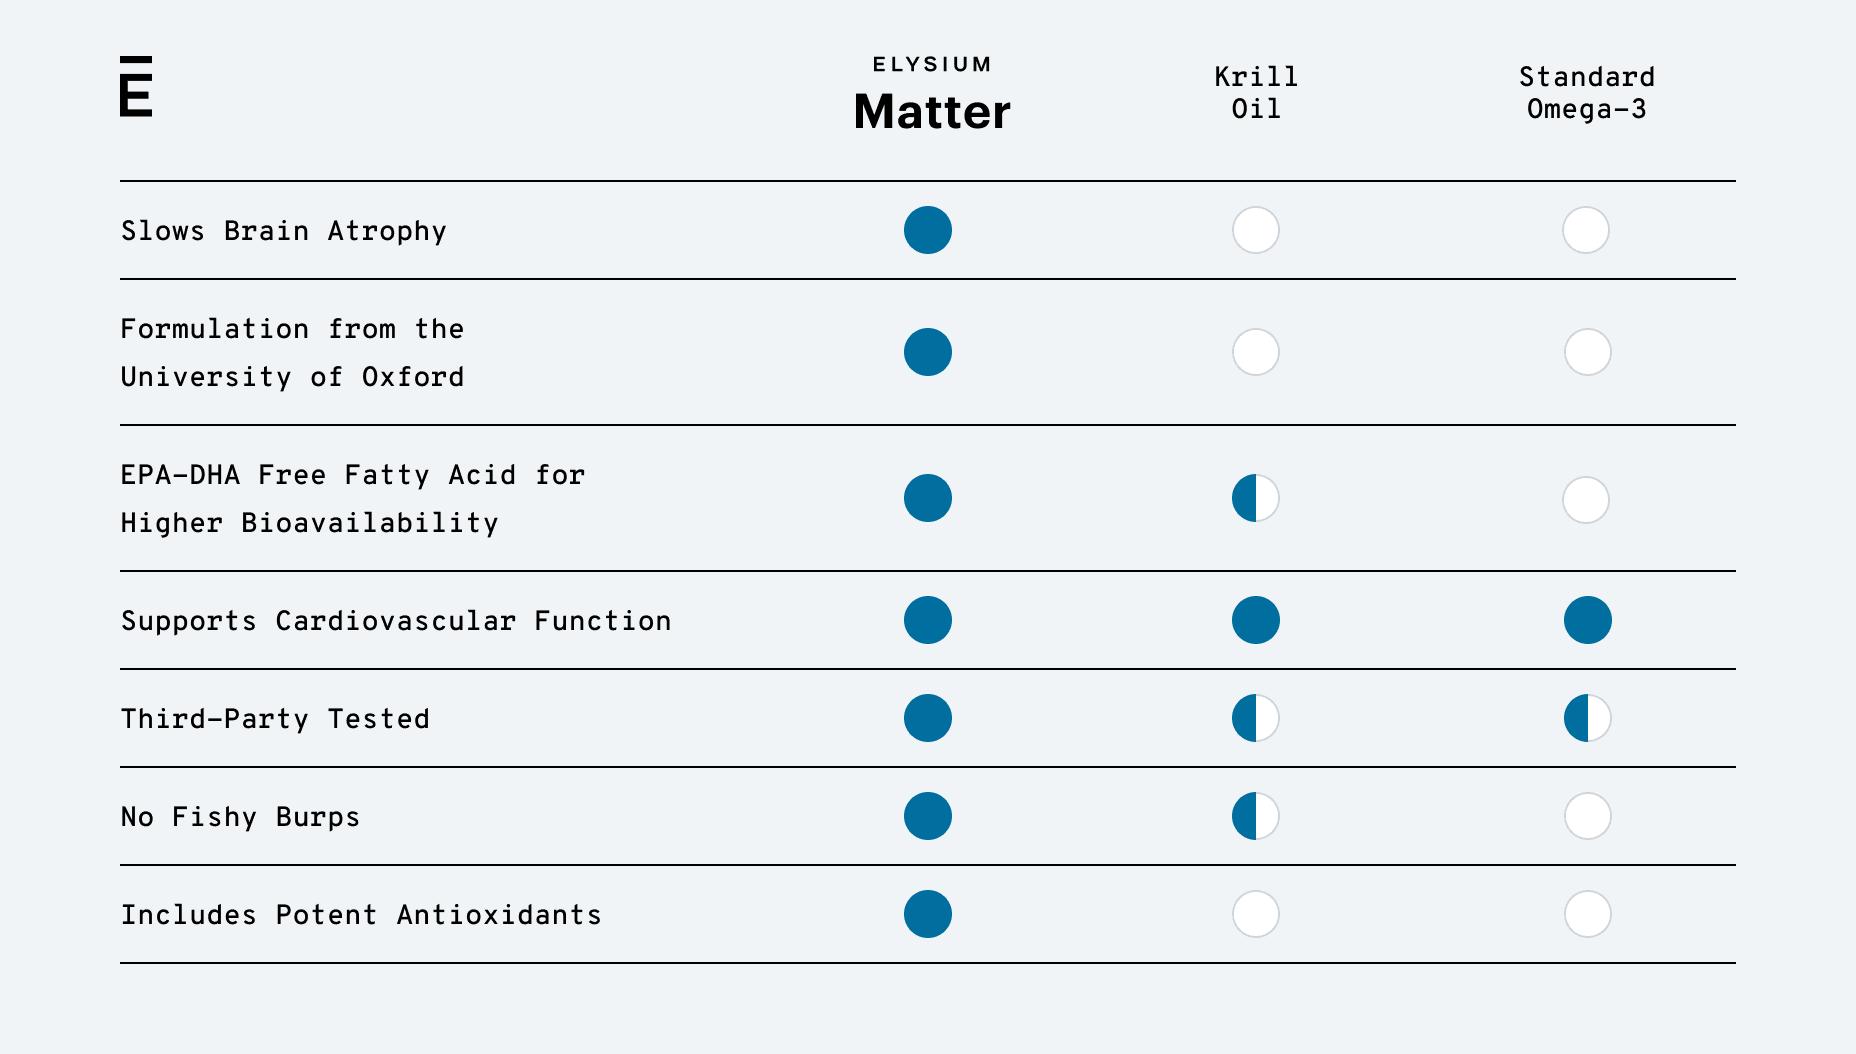 Matter Comparison Chart